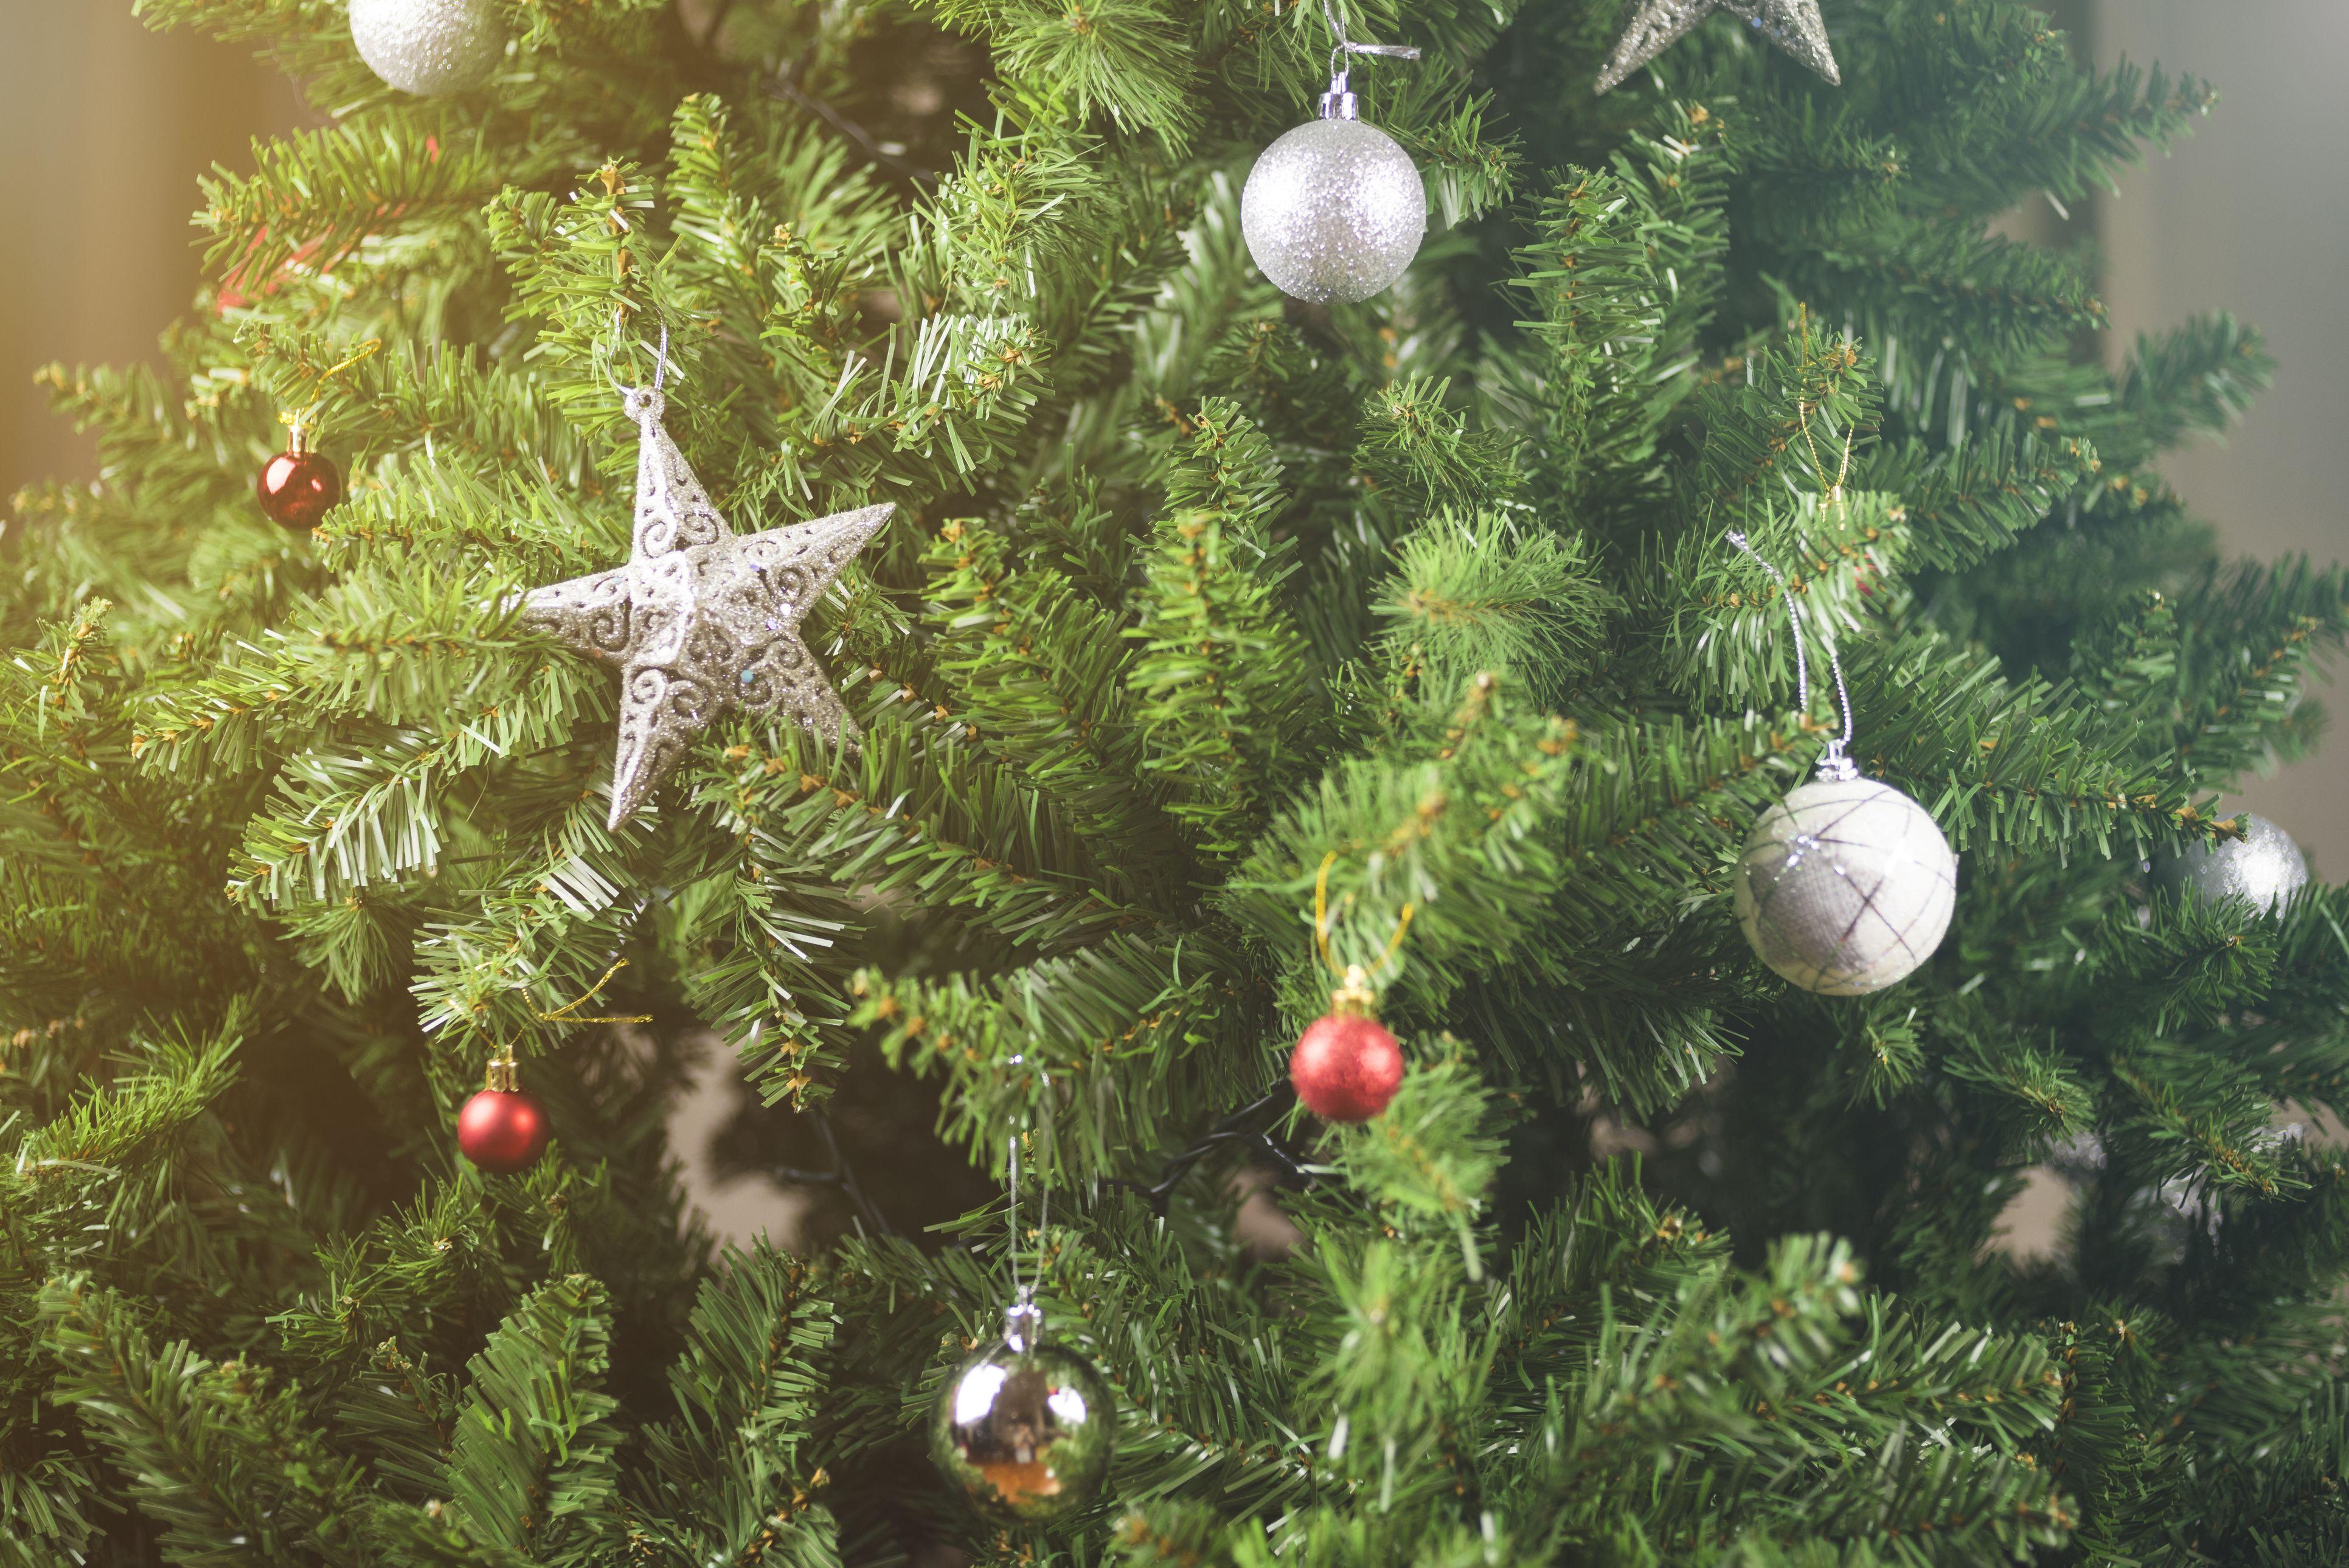 How to Keep Your Christmas Tree Fresh Longer